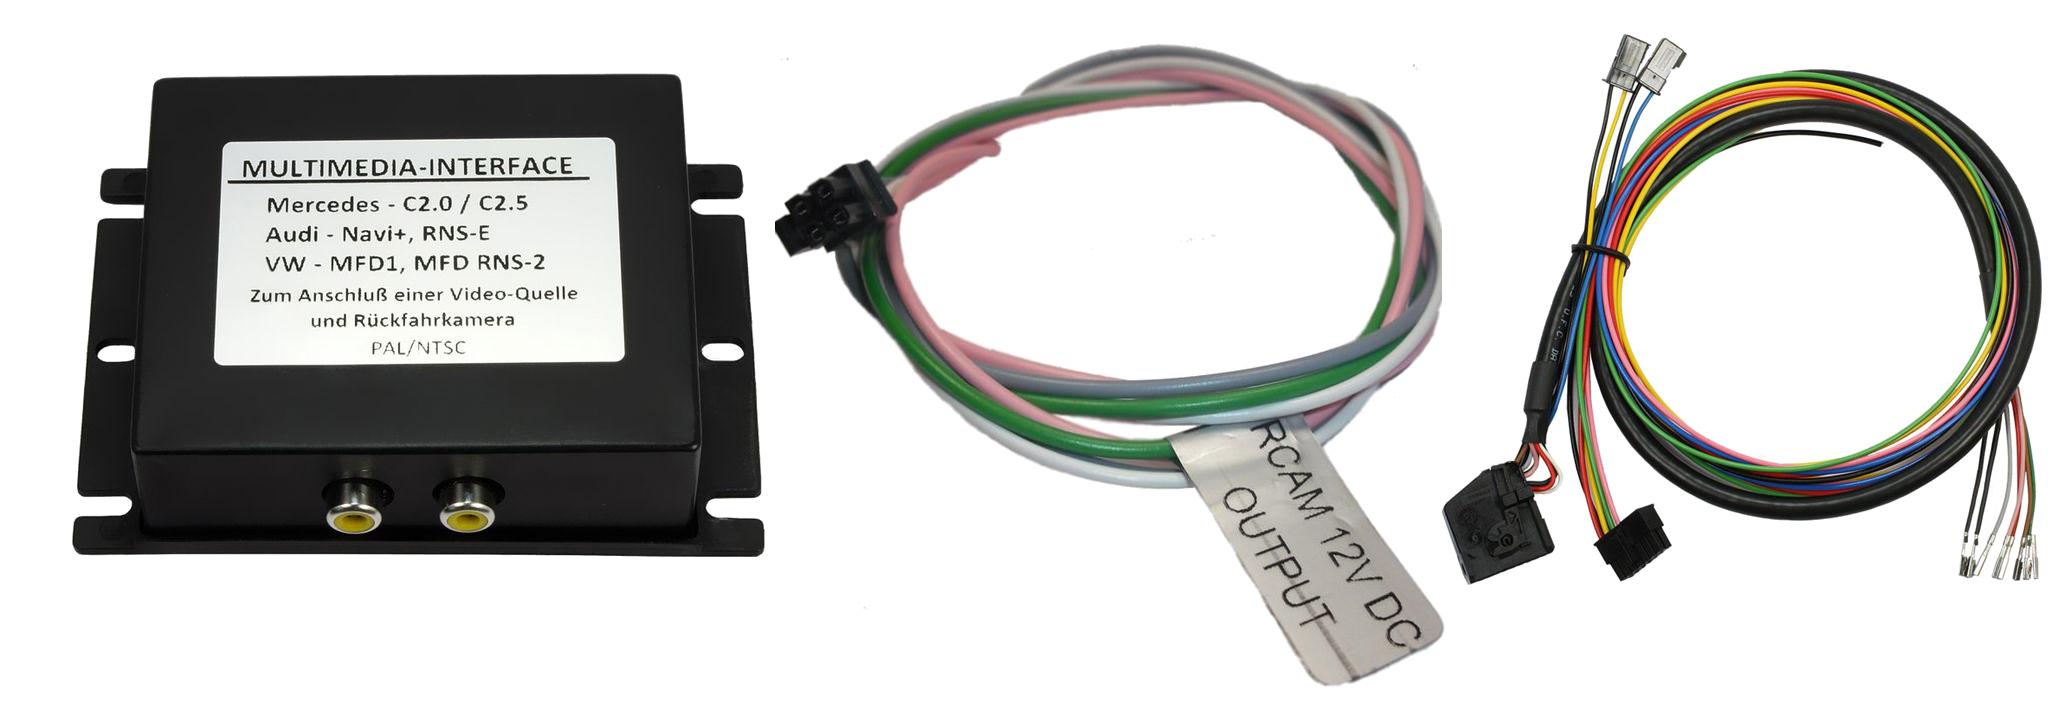 c.LOGiC lite passend für VAG MFD2/RNS2,Nexus RFK Hi